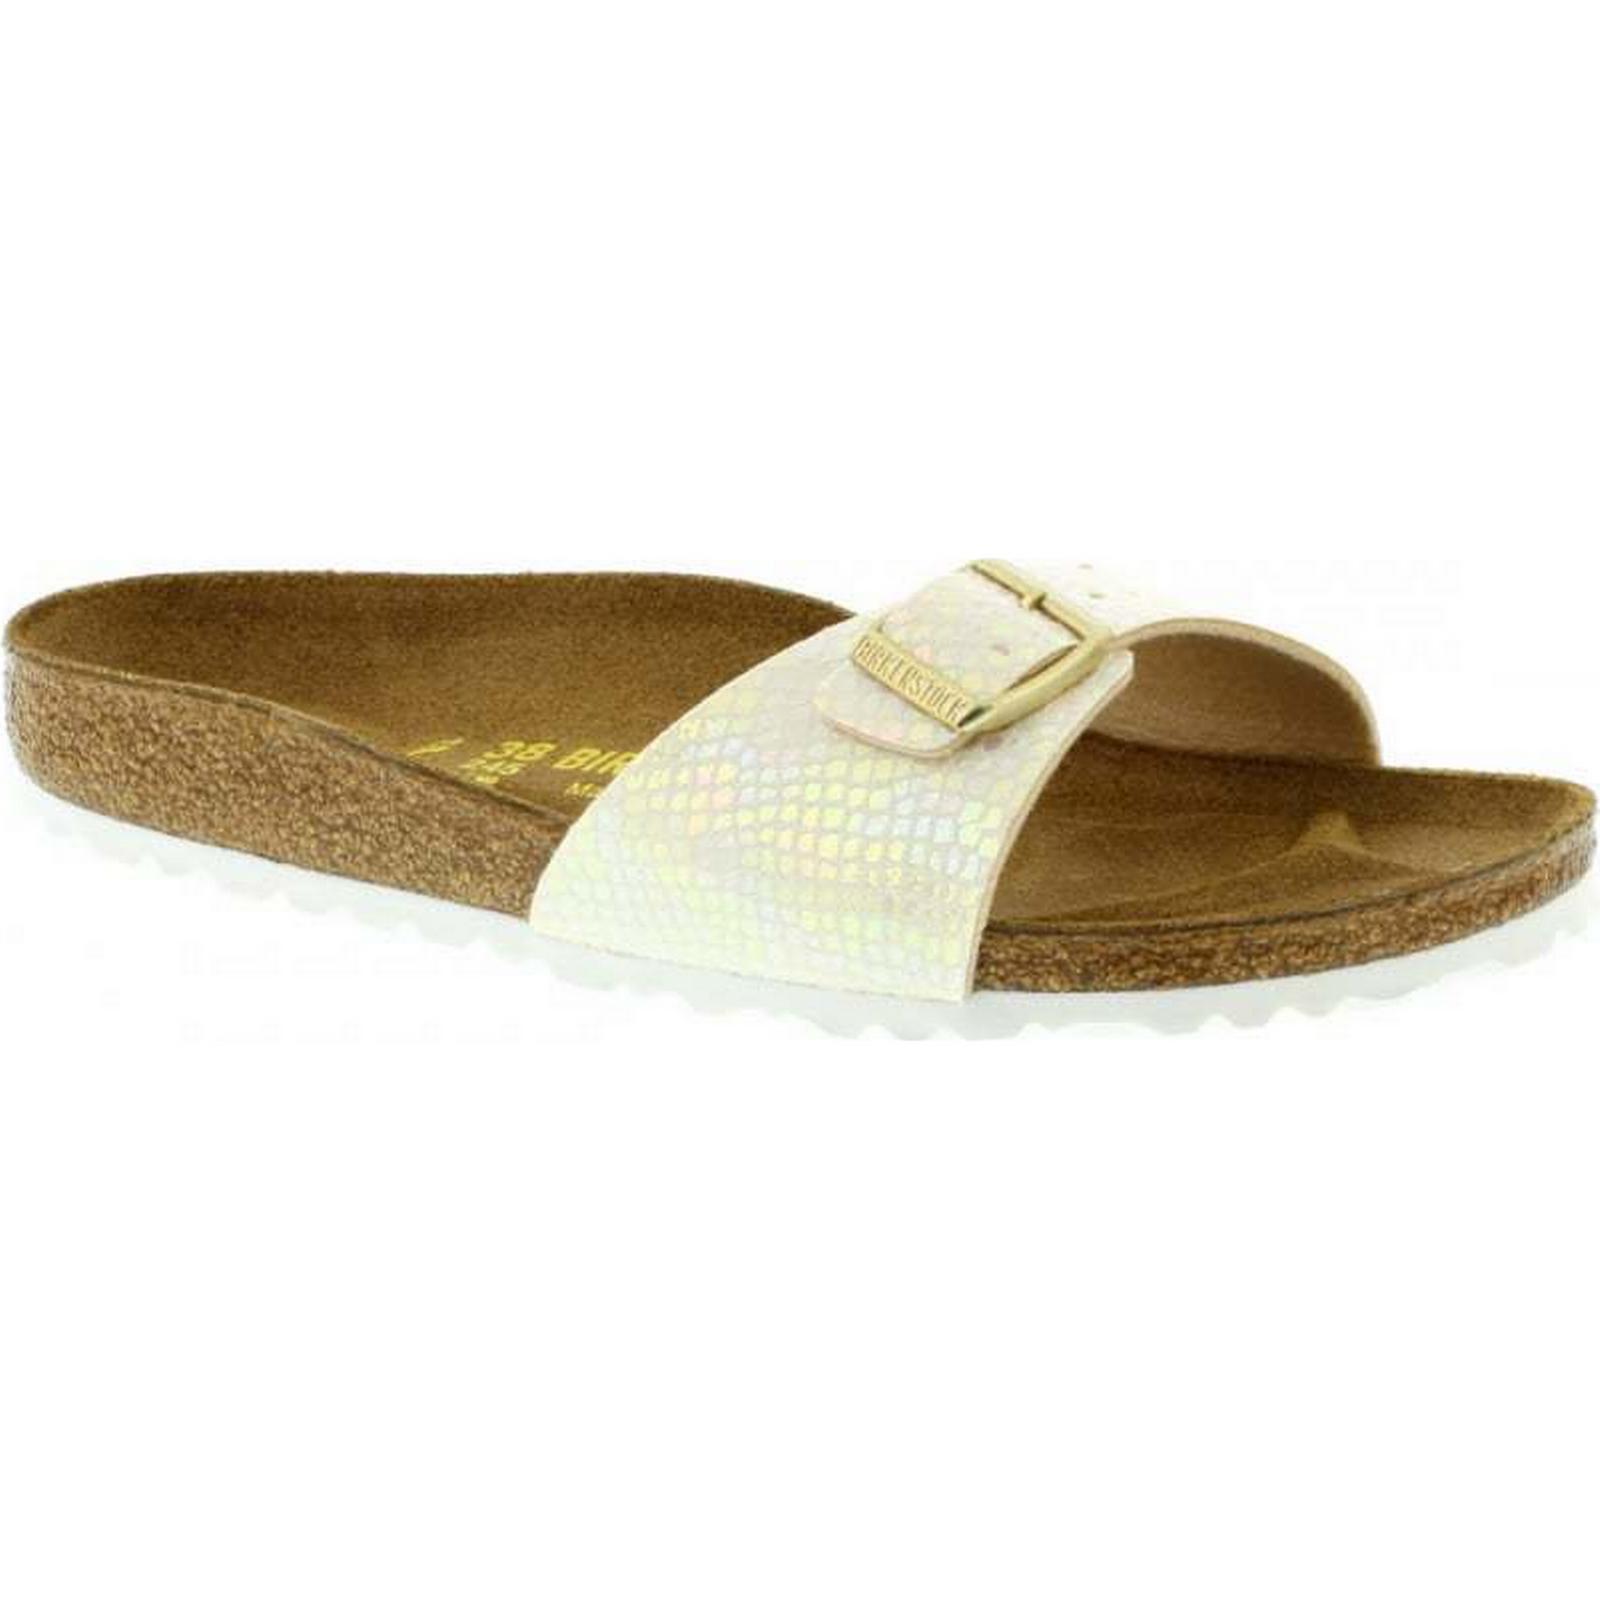 Birkenstock Madrid Narrow Fit Size: - Shiny Snake Cream 439913 Size: Fit 37 EU e0dadb